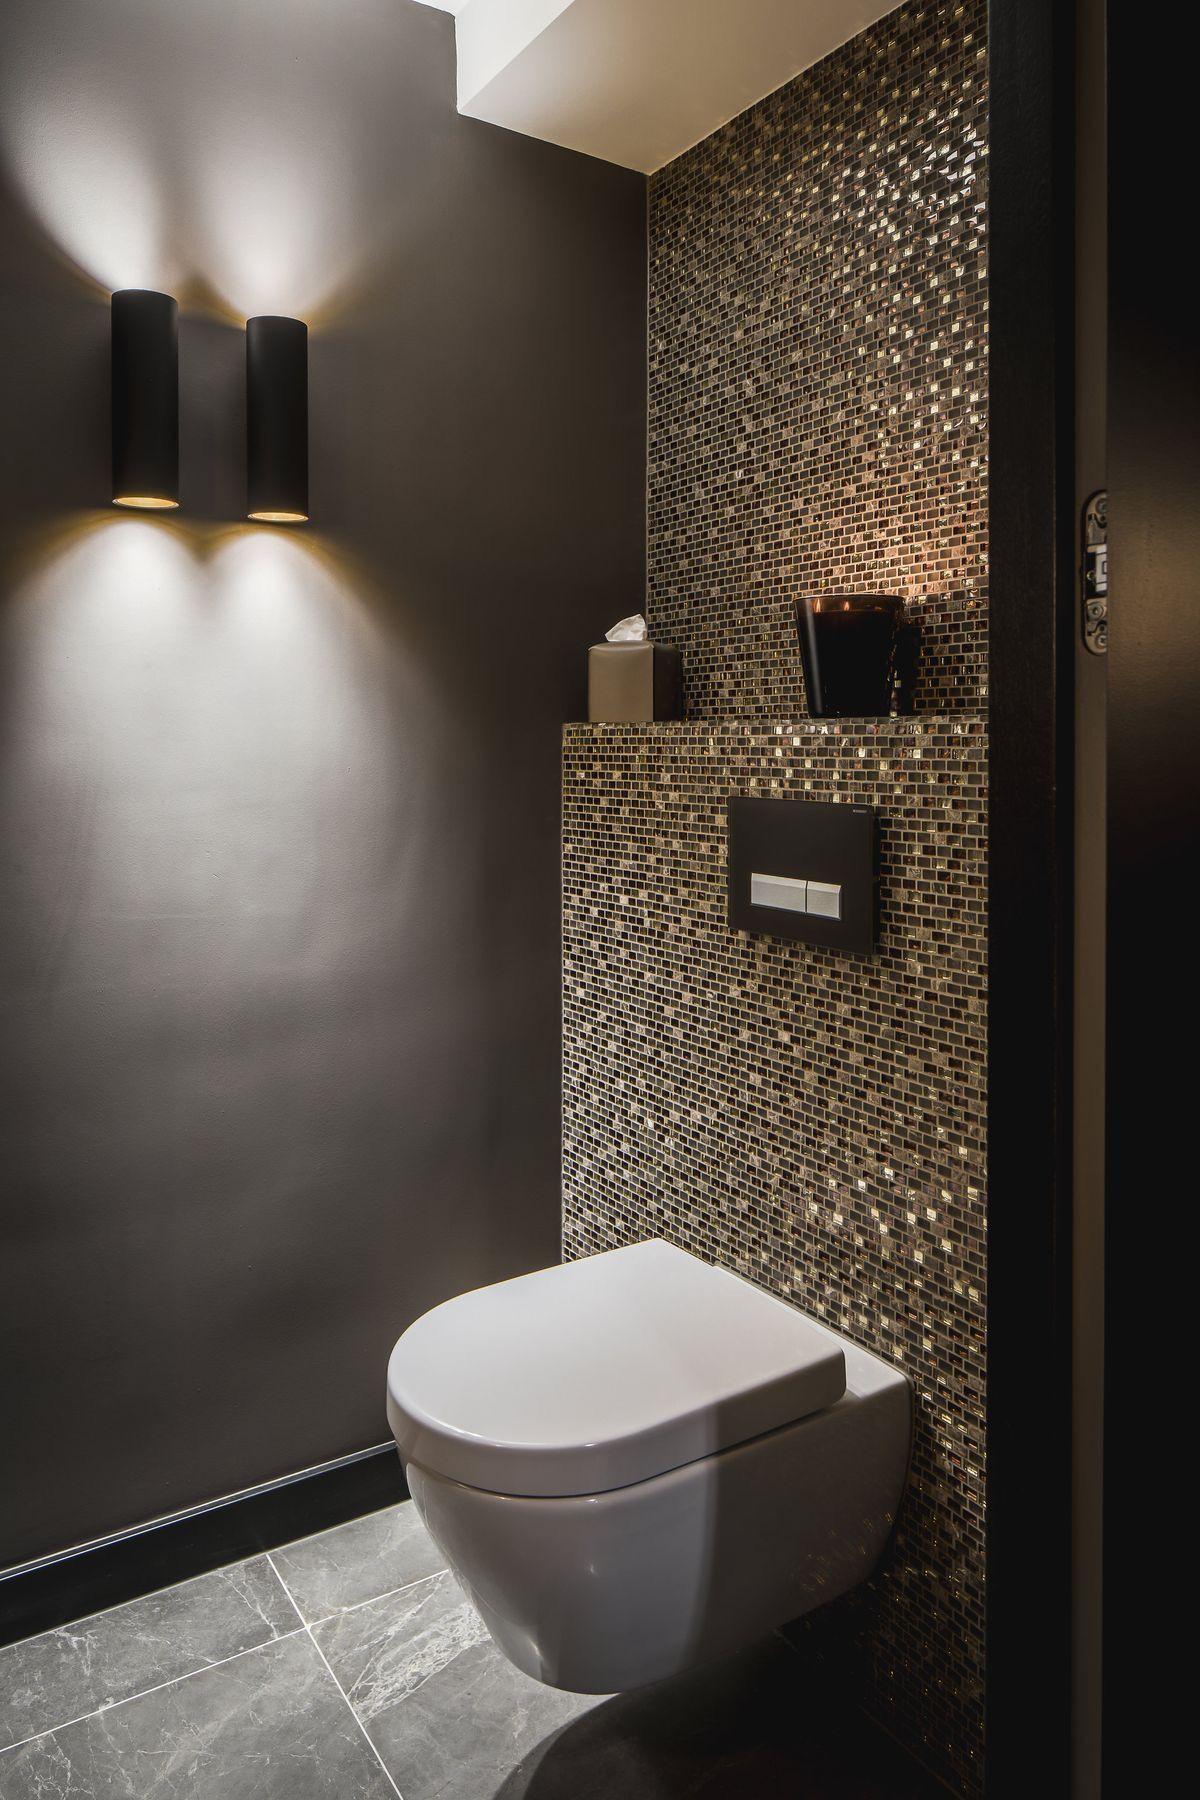 Best Kitchen Gallery: Cocoon Toiletroom Design Bycocoon Toiletroom Design of Bathroom Design Inspiration  on rachelxblog.com